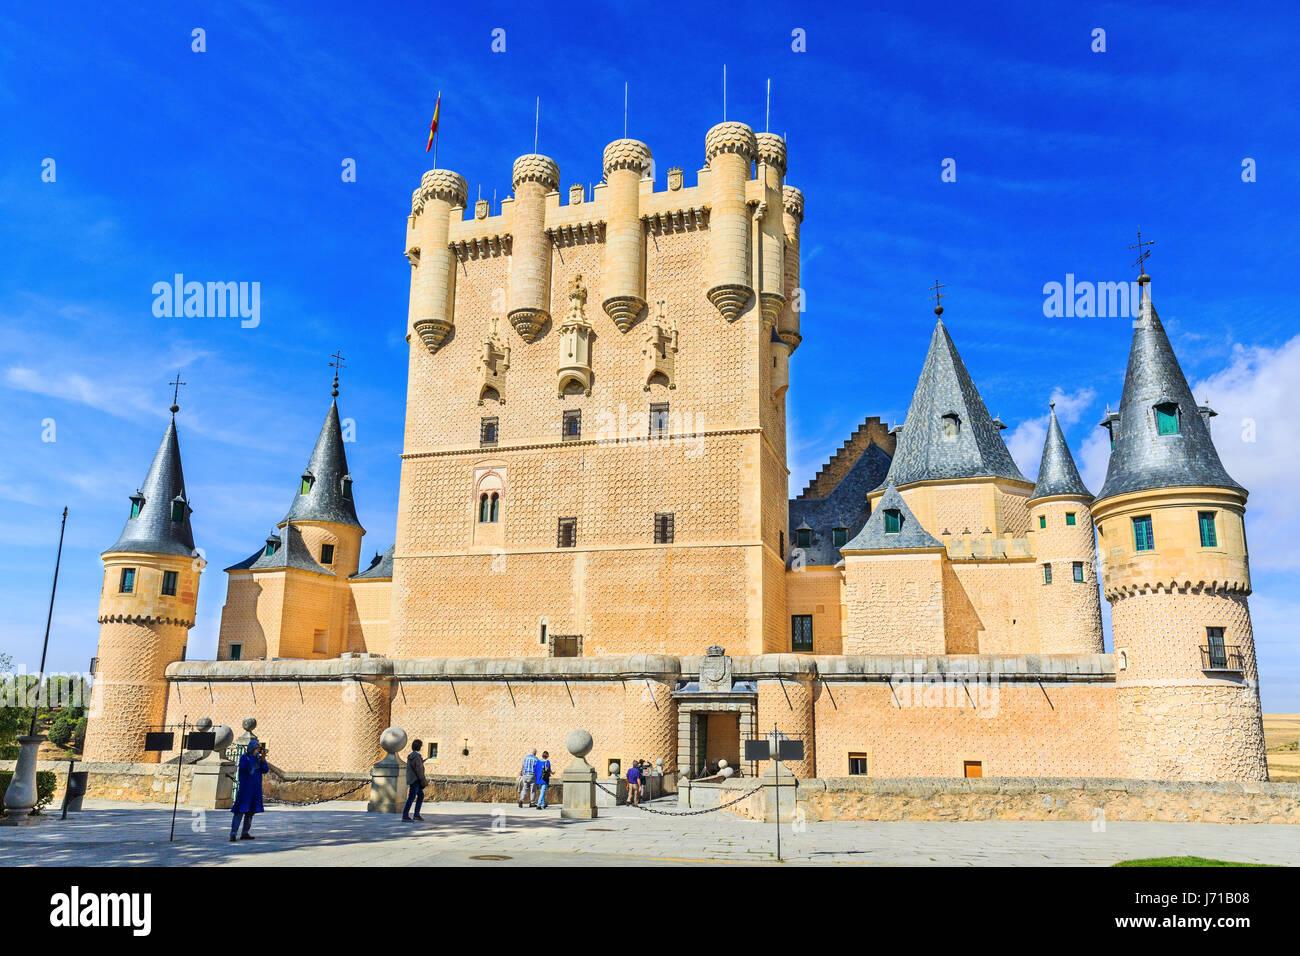 Segovia, Spain. The Alcazar of Segovia. Castilla y Leon. - Stock Image